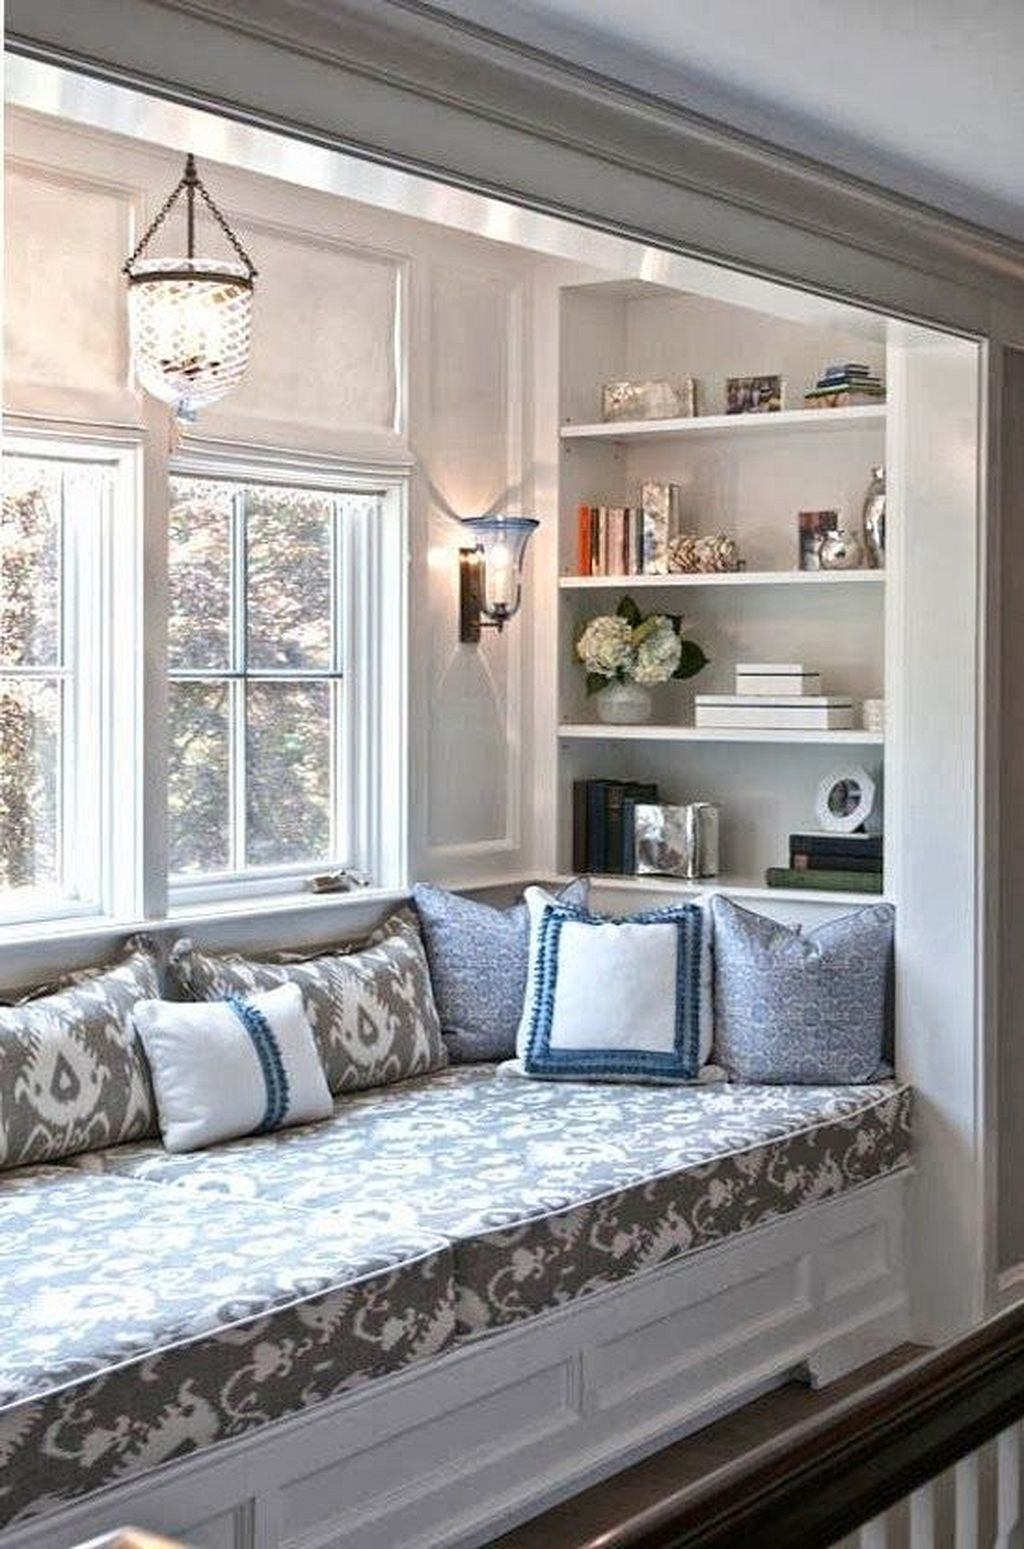 Shelf across kitchen window   cozy nook bed window seat inspiration  window reading nooks and